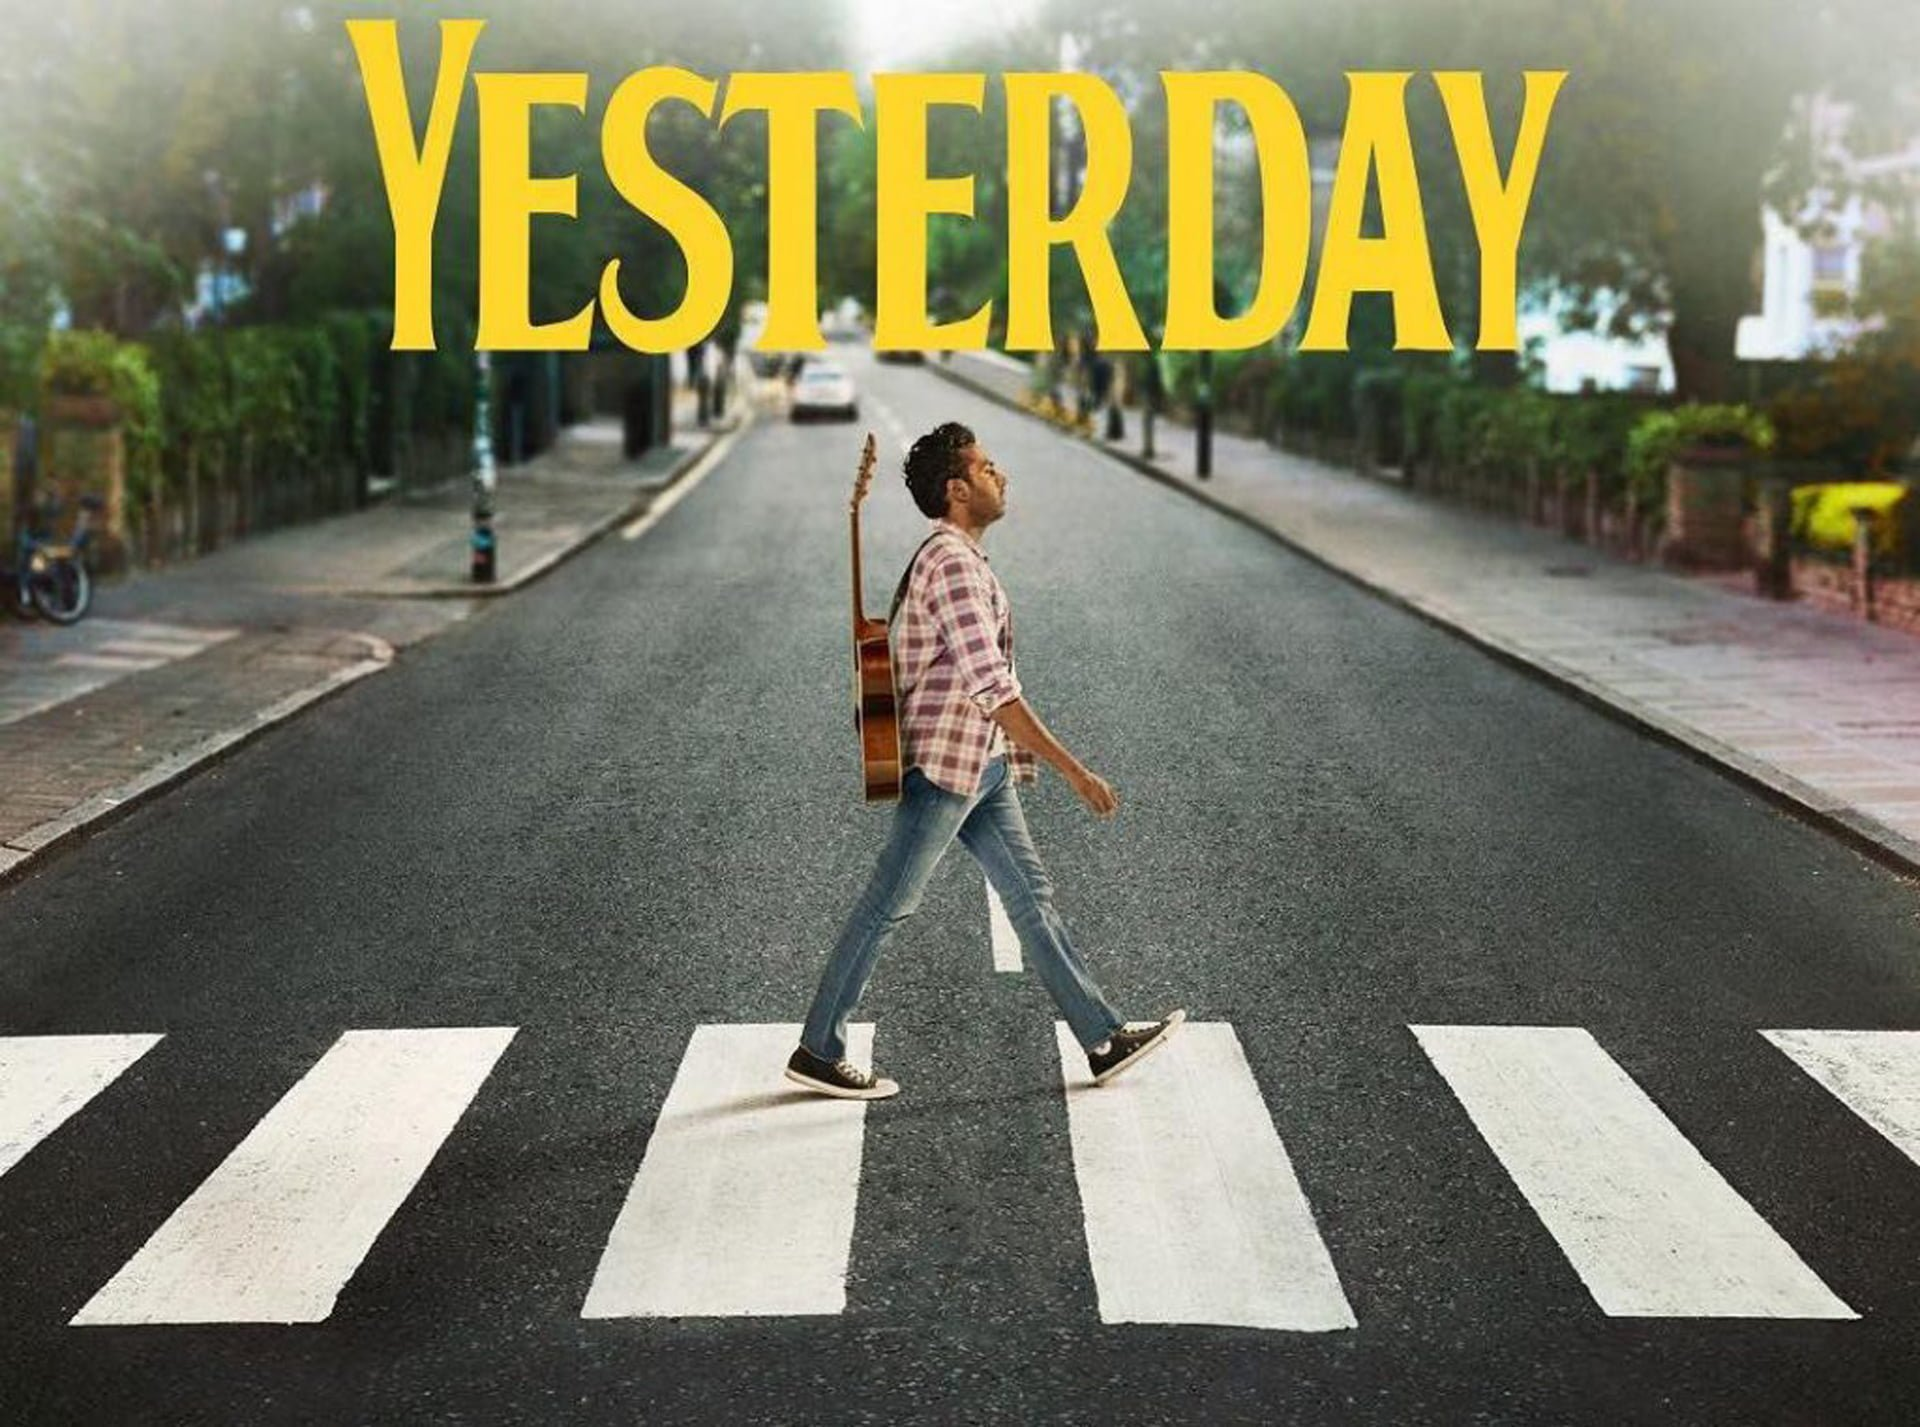 Yesterday: Che Mondo Sarebbe Senza I Beatles? - Recensione 6 - Hynerd.it